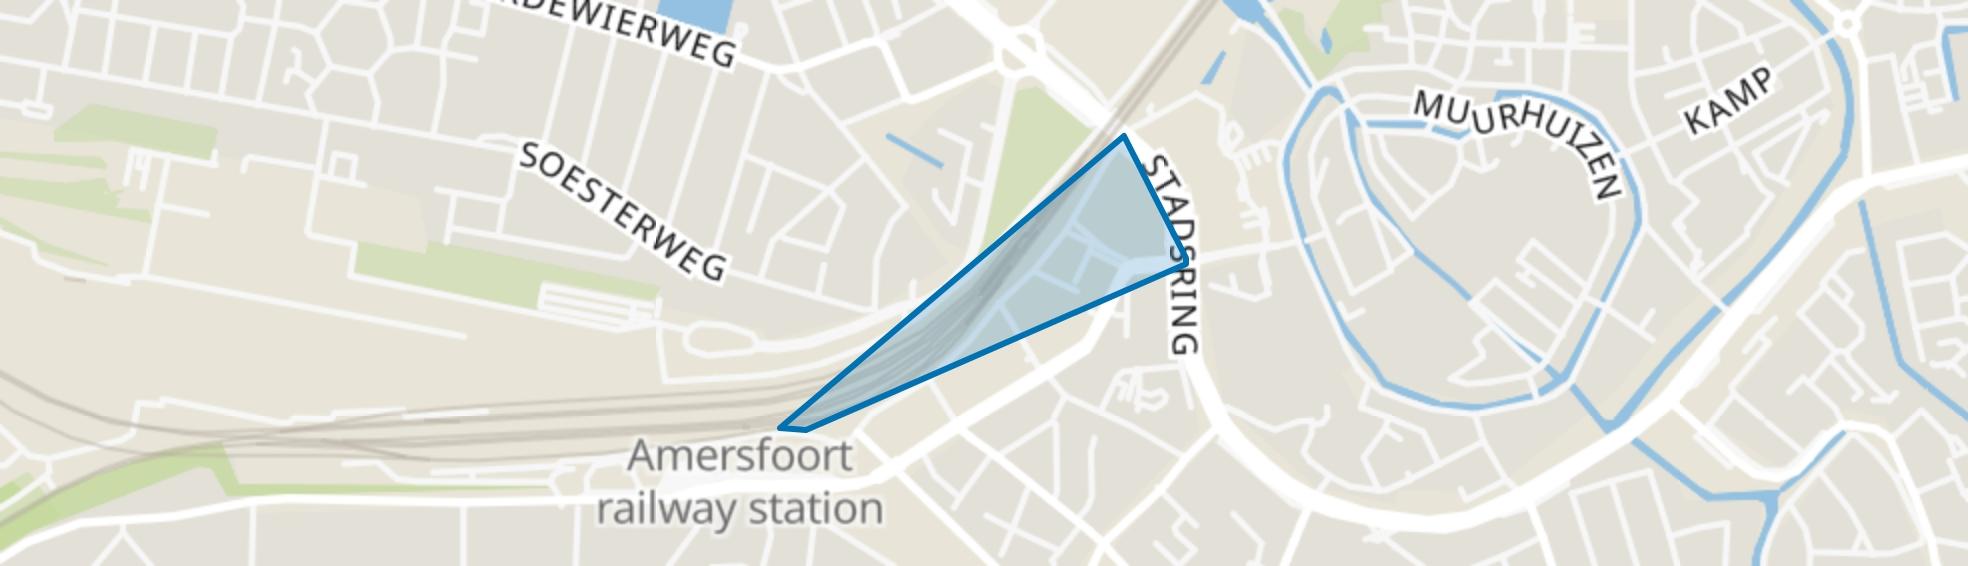 Smallepad, Amersfoort map